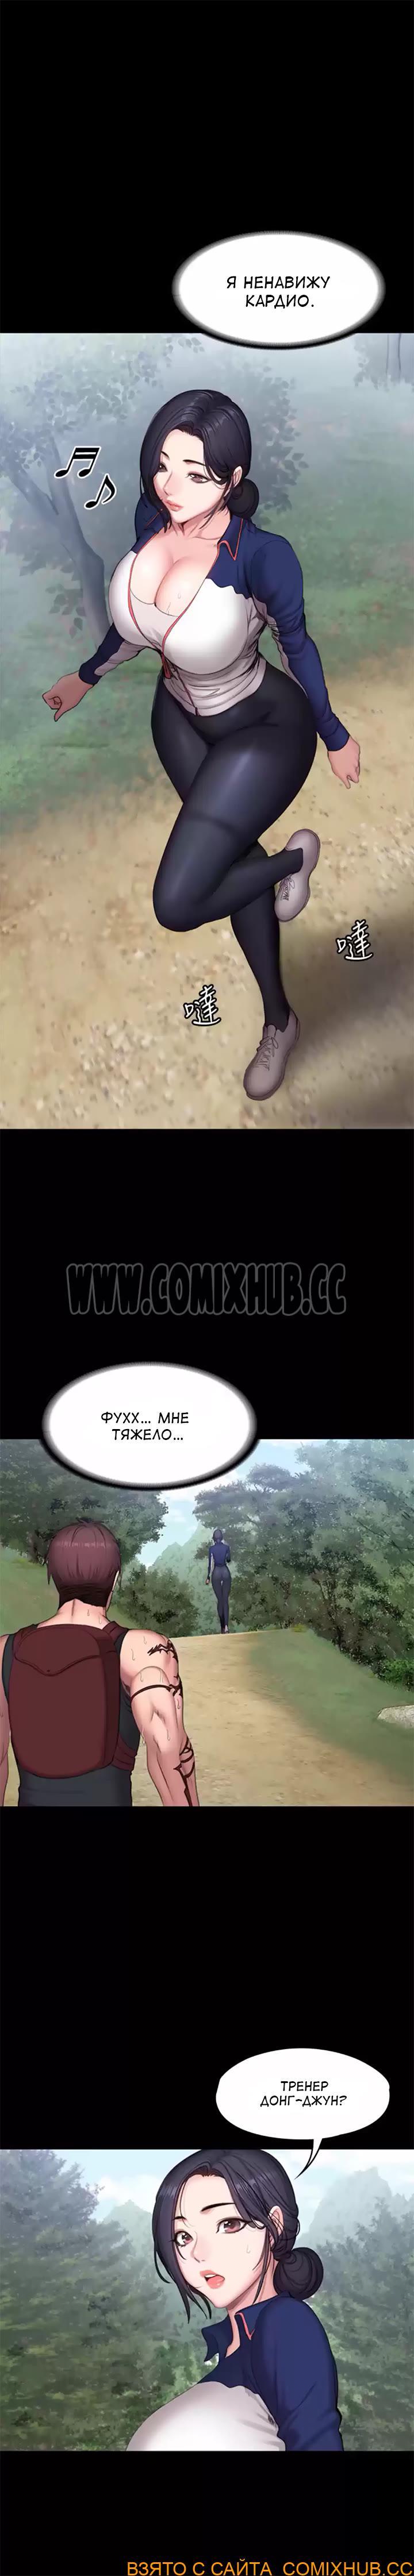 Манхва Фитнес, часть 65 Хентай манга, манхва, Большая грудь, Большая попа, Измена